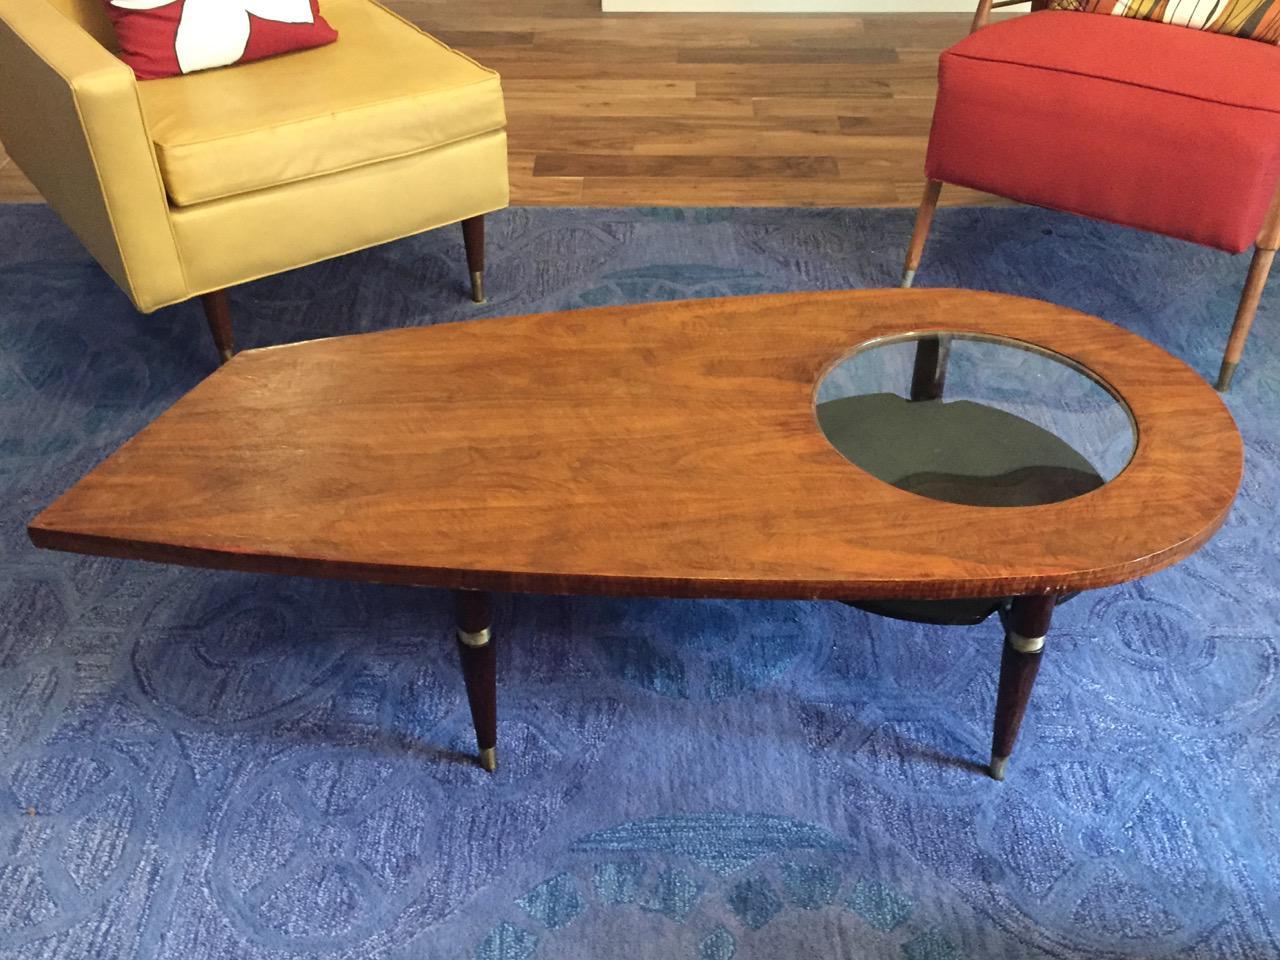 MidCentury Modern Kagan Style Biomorphic Coffee Table Chairish